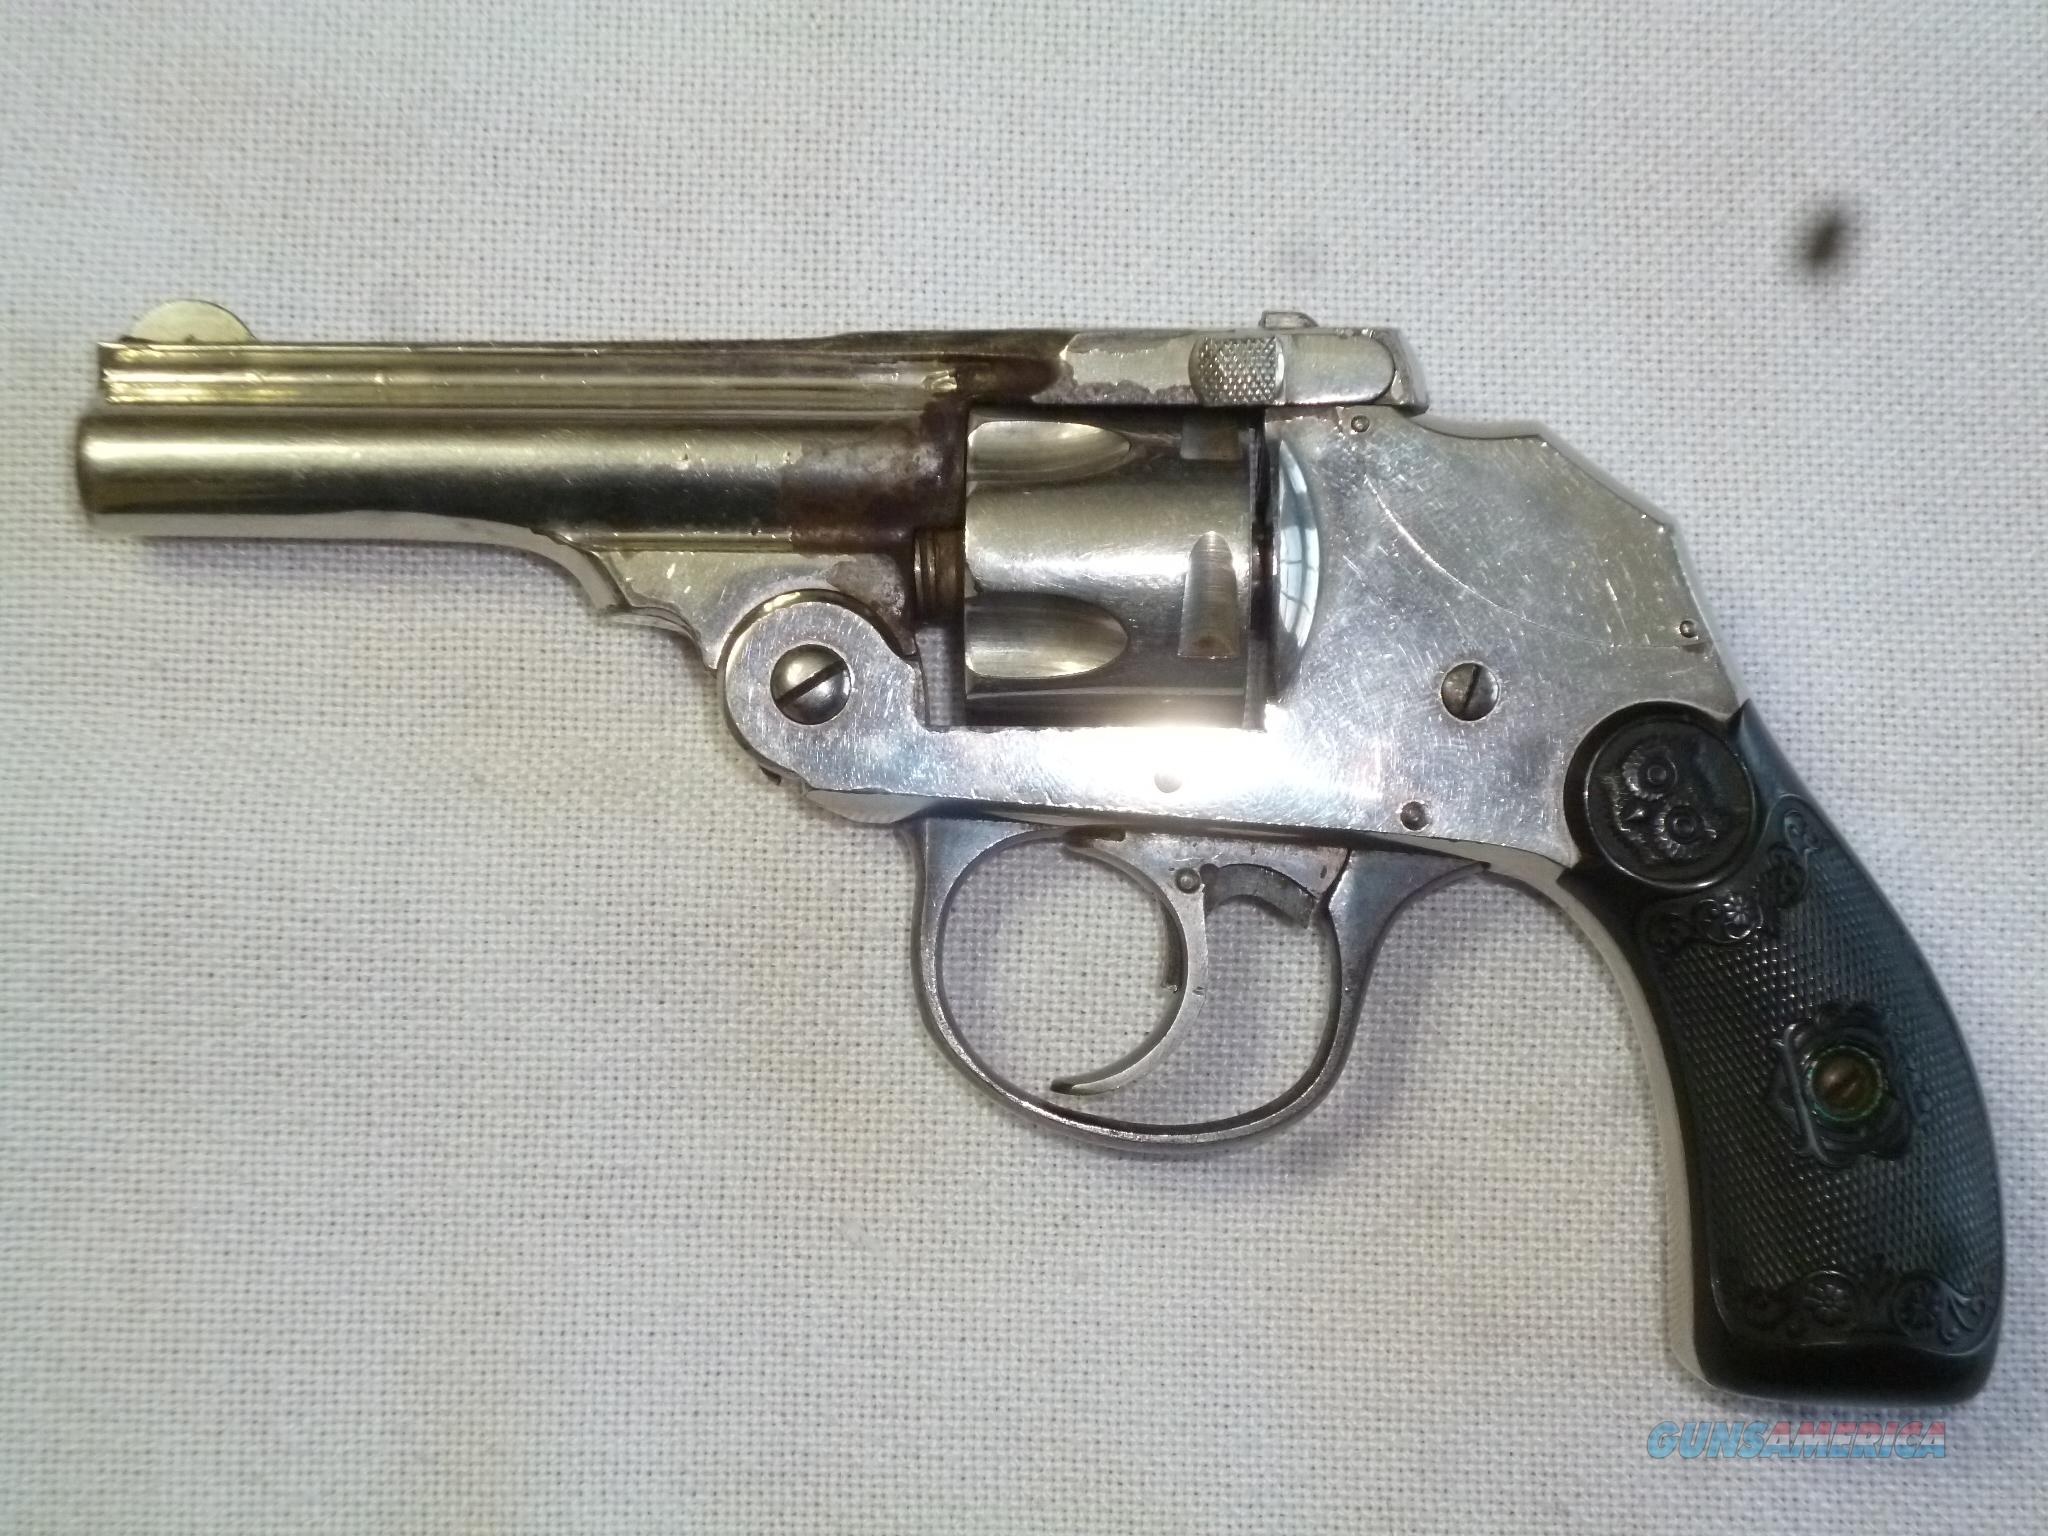 G I Joe Accessoire 2008 Copperhead V4 Browning Automatic Pistol Gun